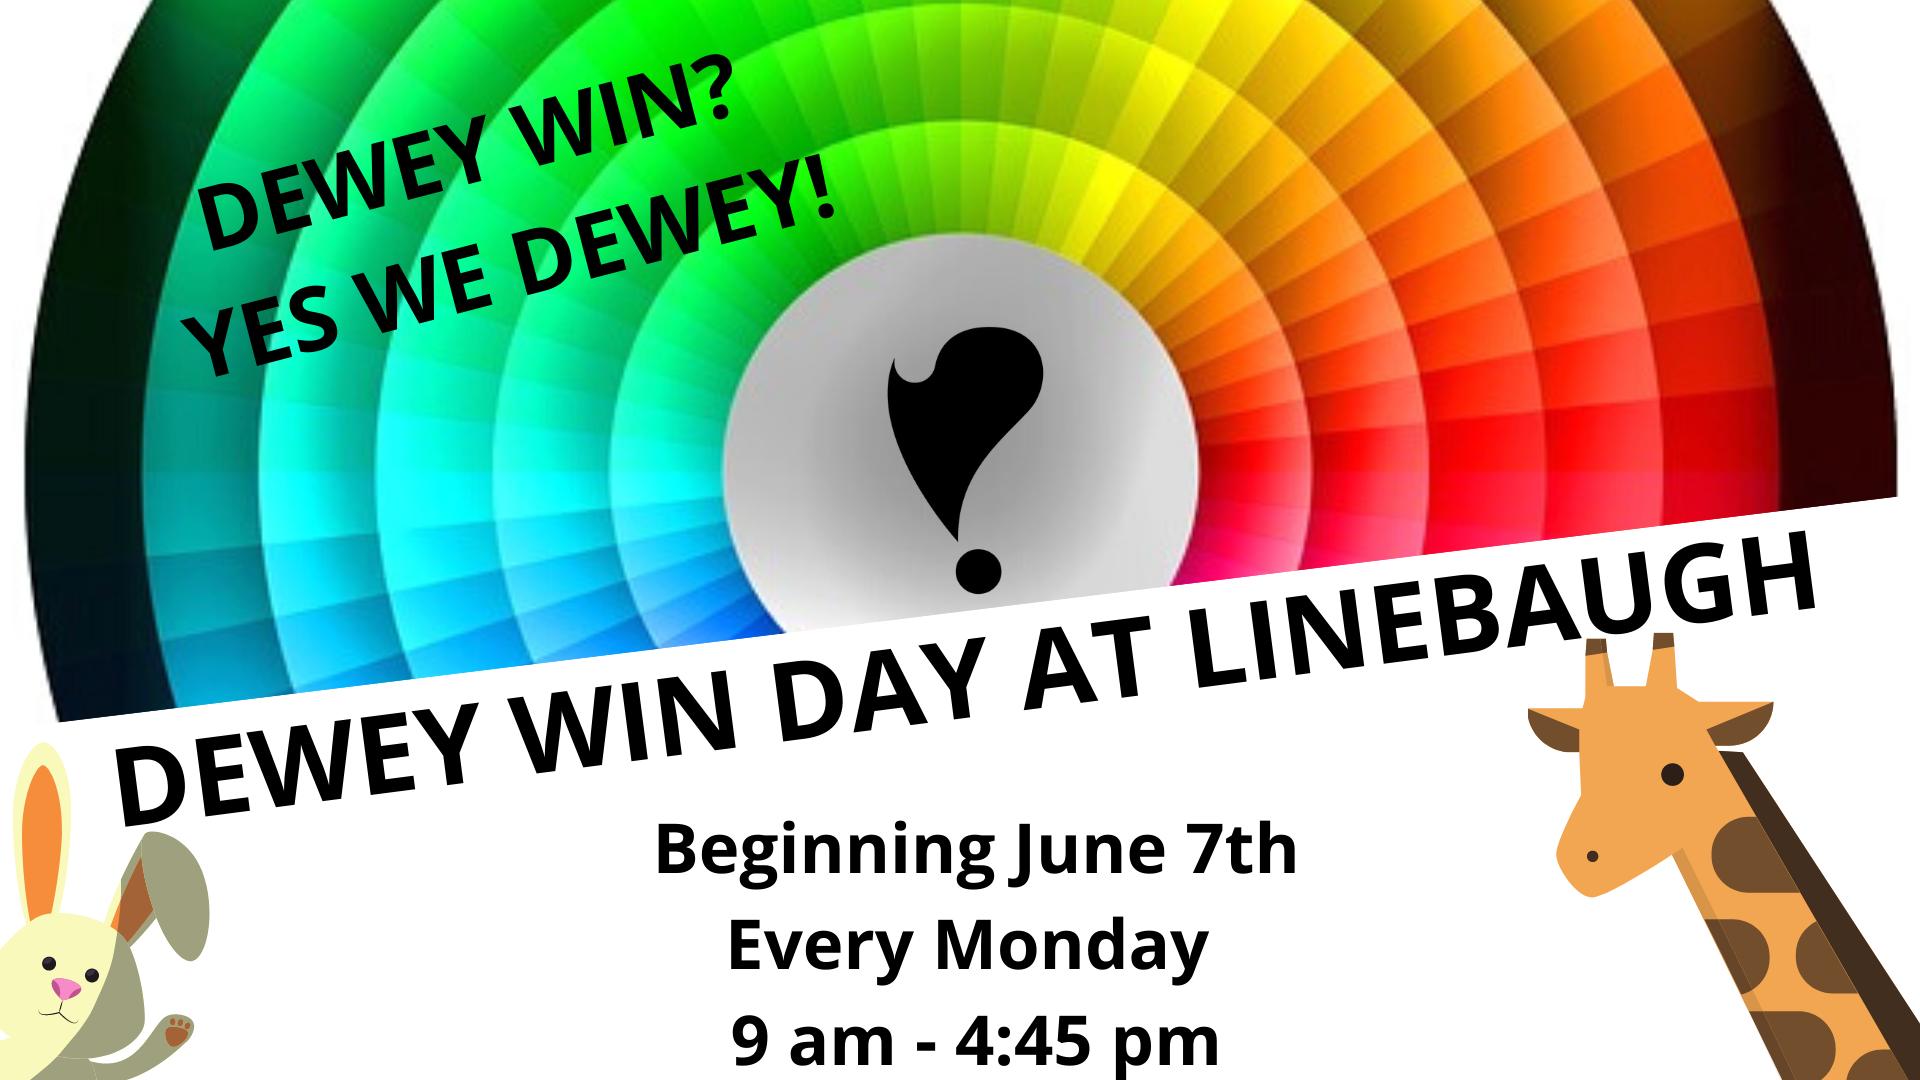 Dewey Win Day at Linebaugh